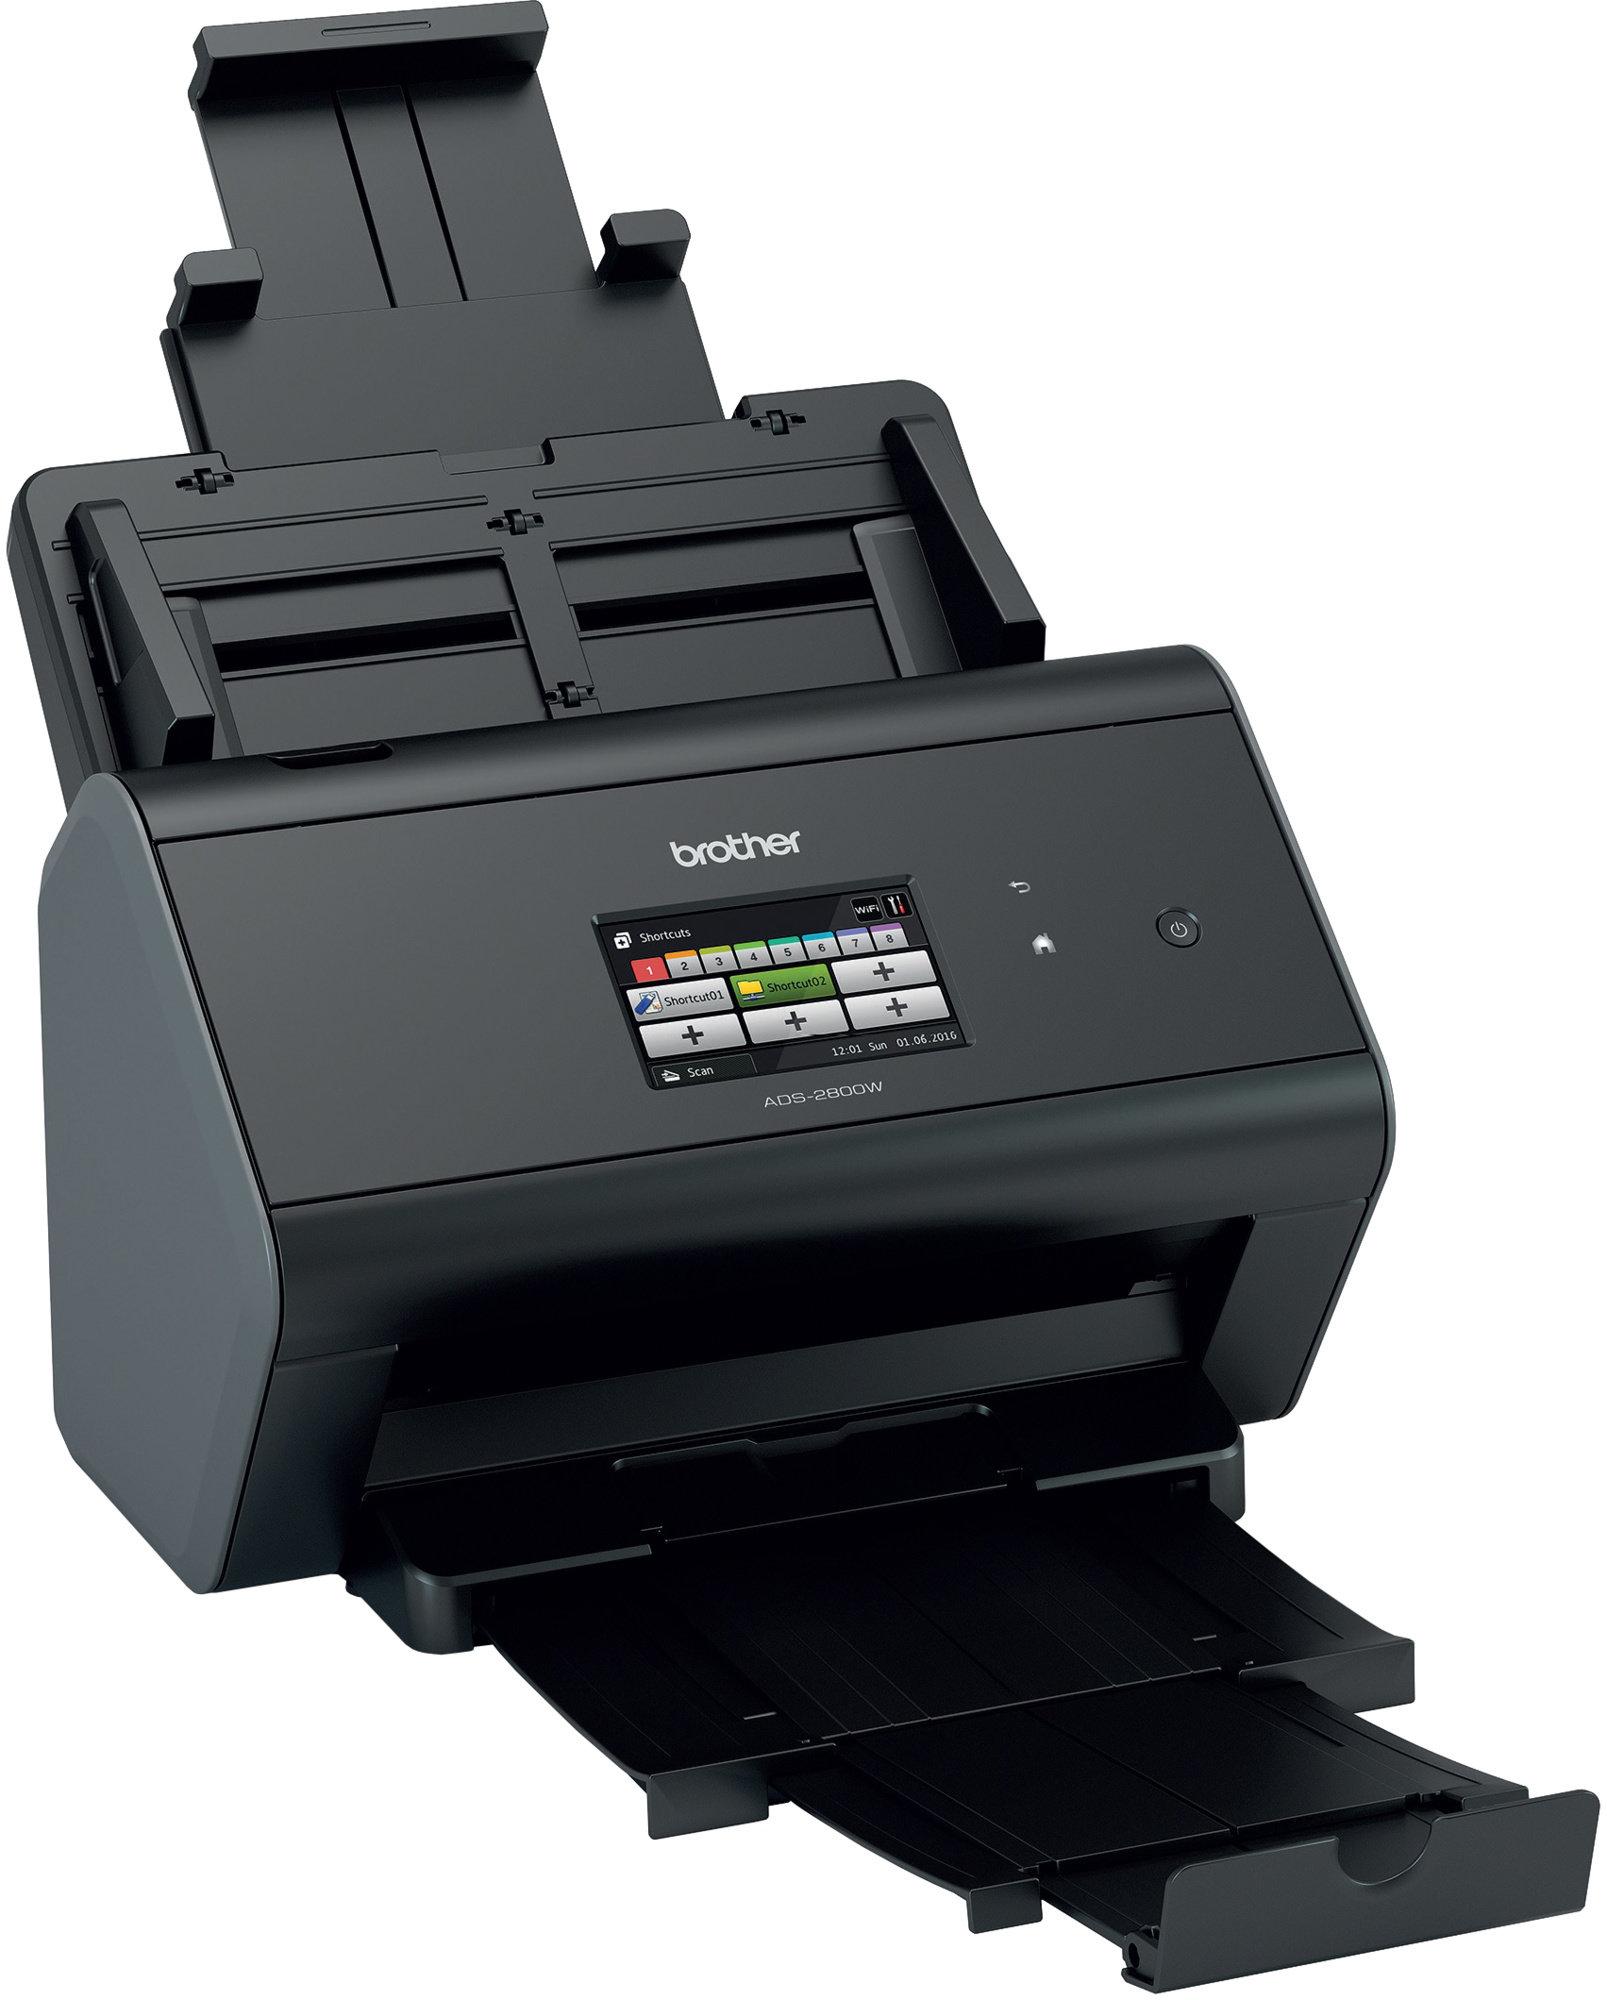 BROTHER skener ADS-2800W DUALSKEN (až 30 str/min, 600 x 600 dpi, aut.duplex, LCD,512MB) WiFi+LAN